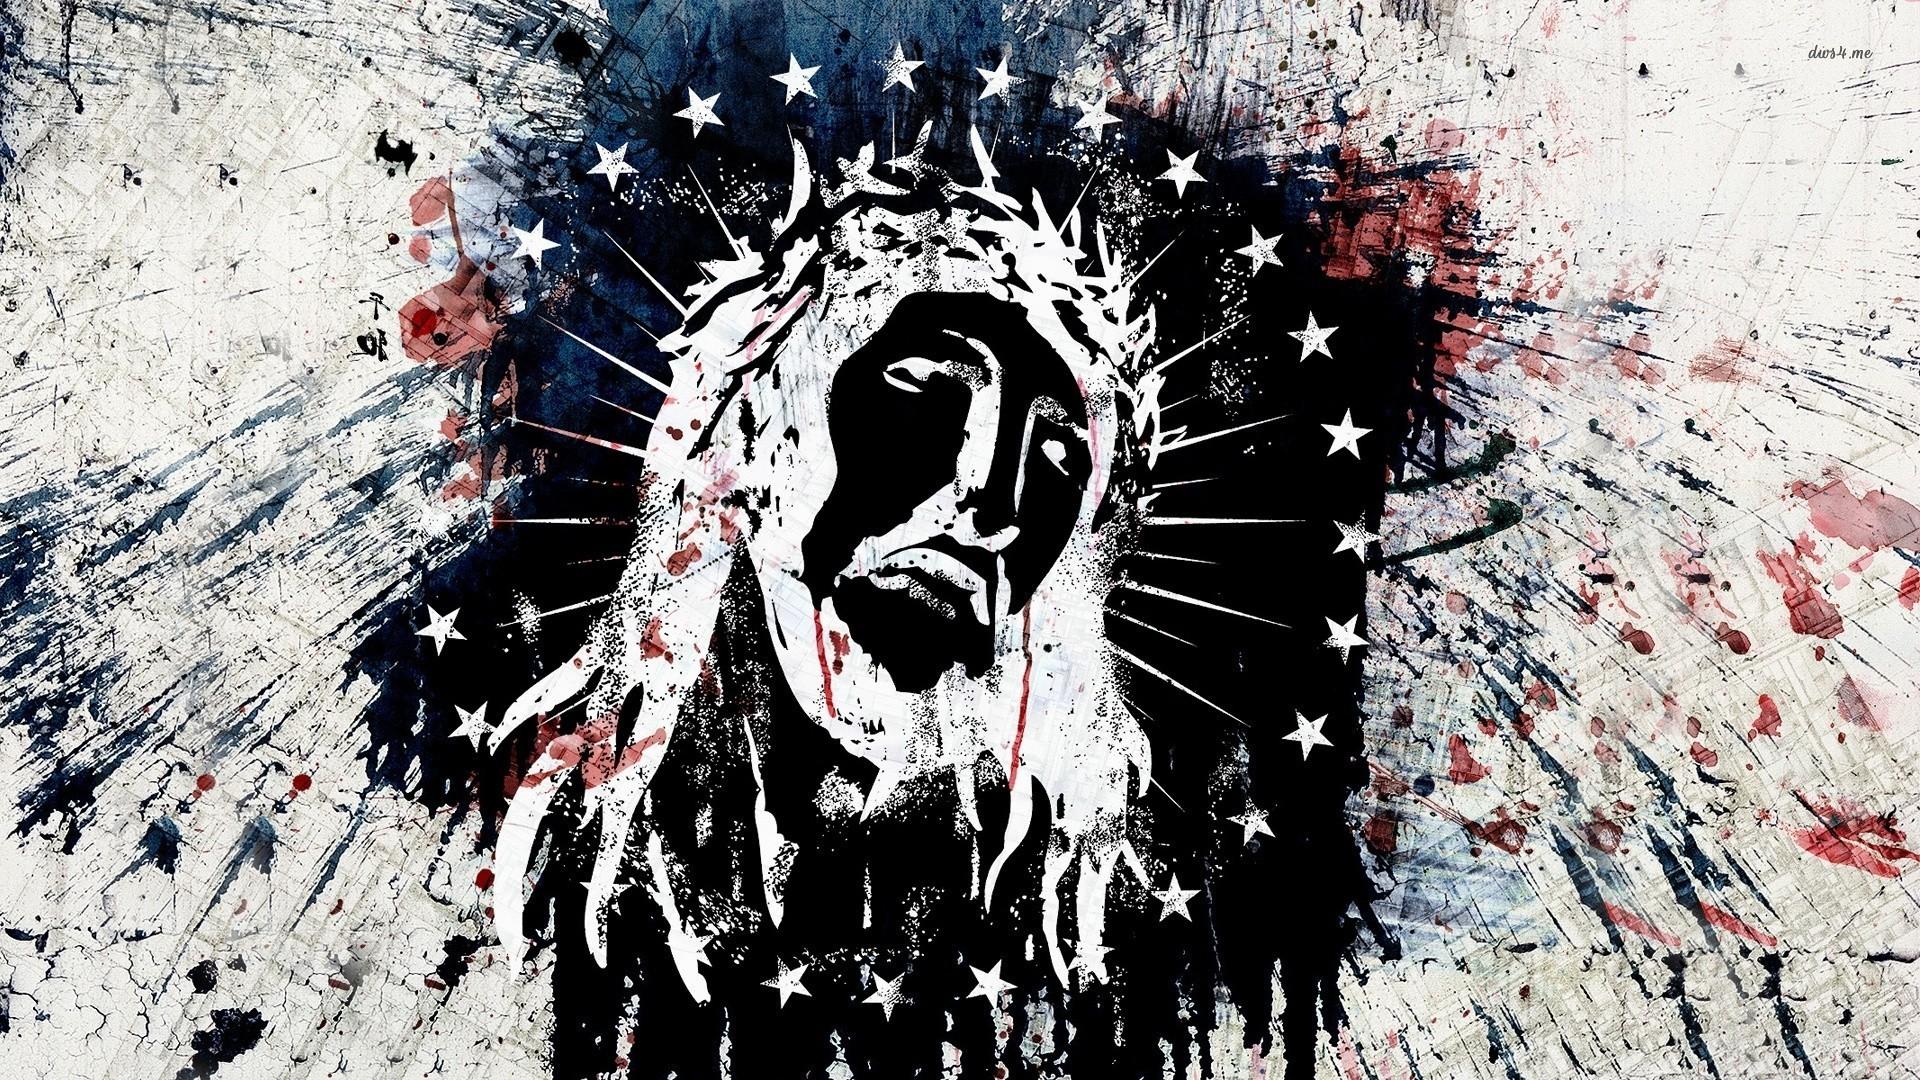 Jesus Wallpapers Images HD cartoon sketch